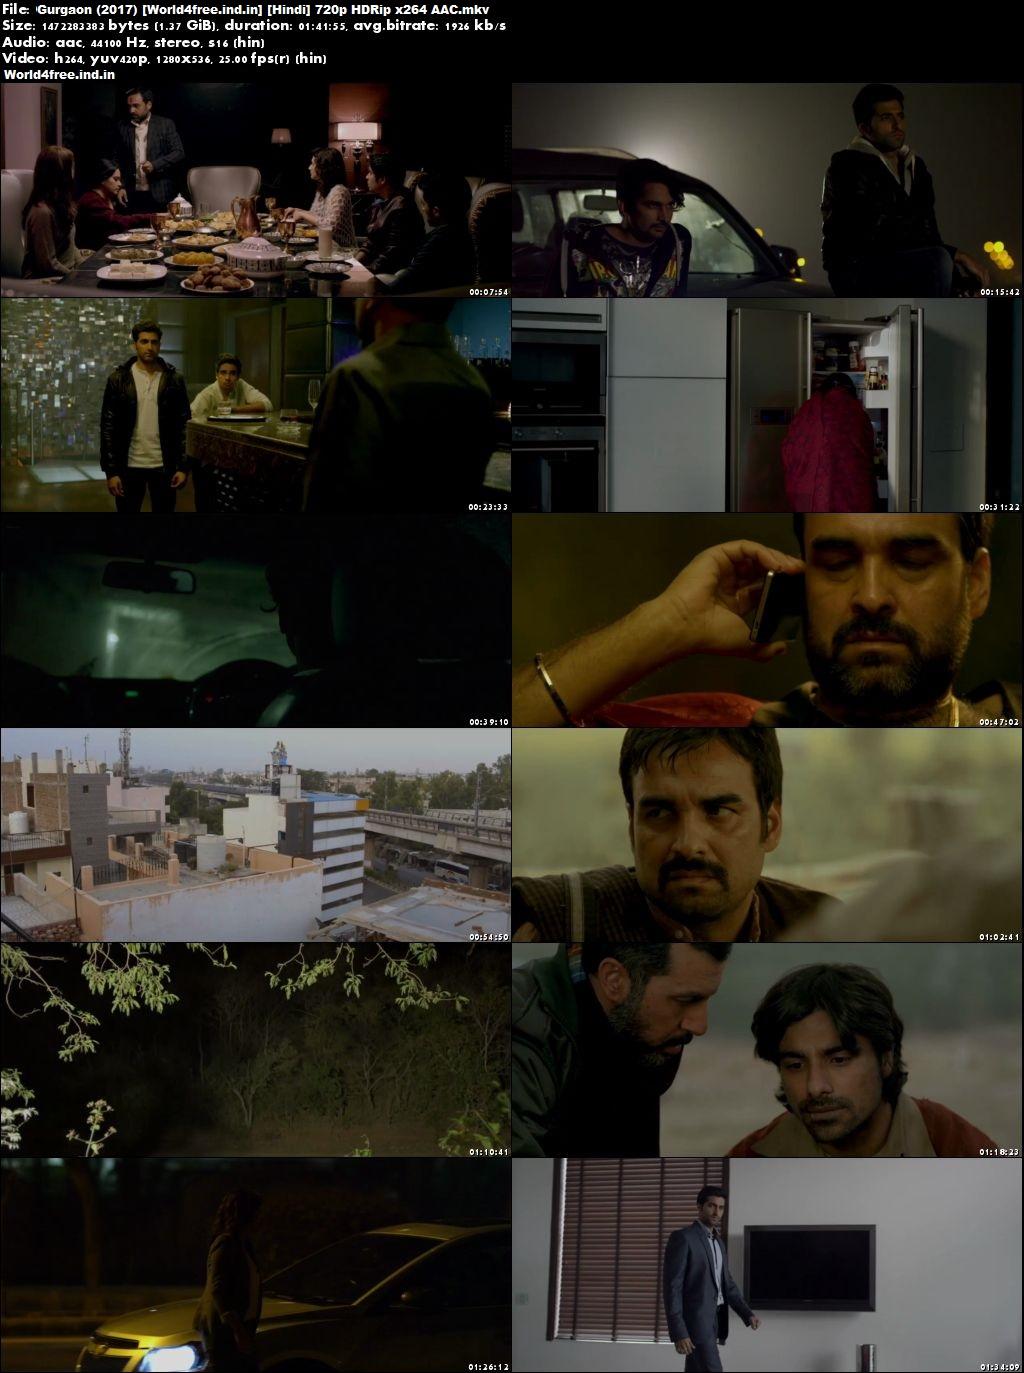 Gurgaon 2017 worldfree4u Full HDRip 720p Hindi Movie Download